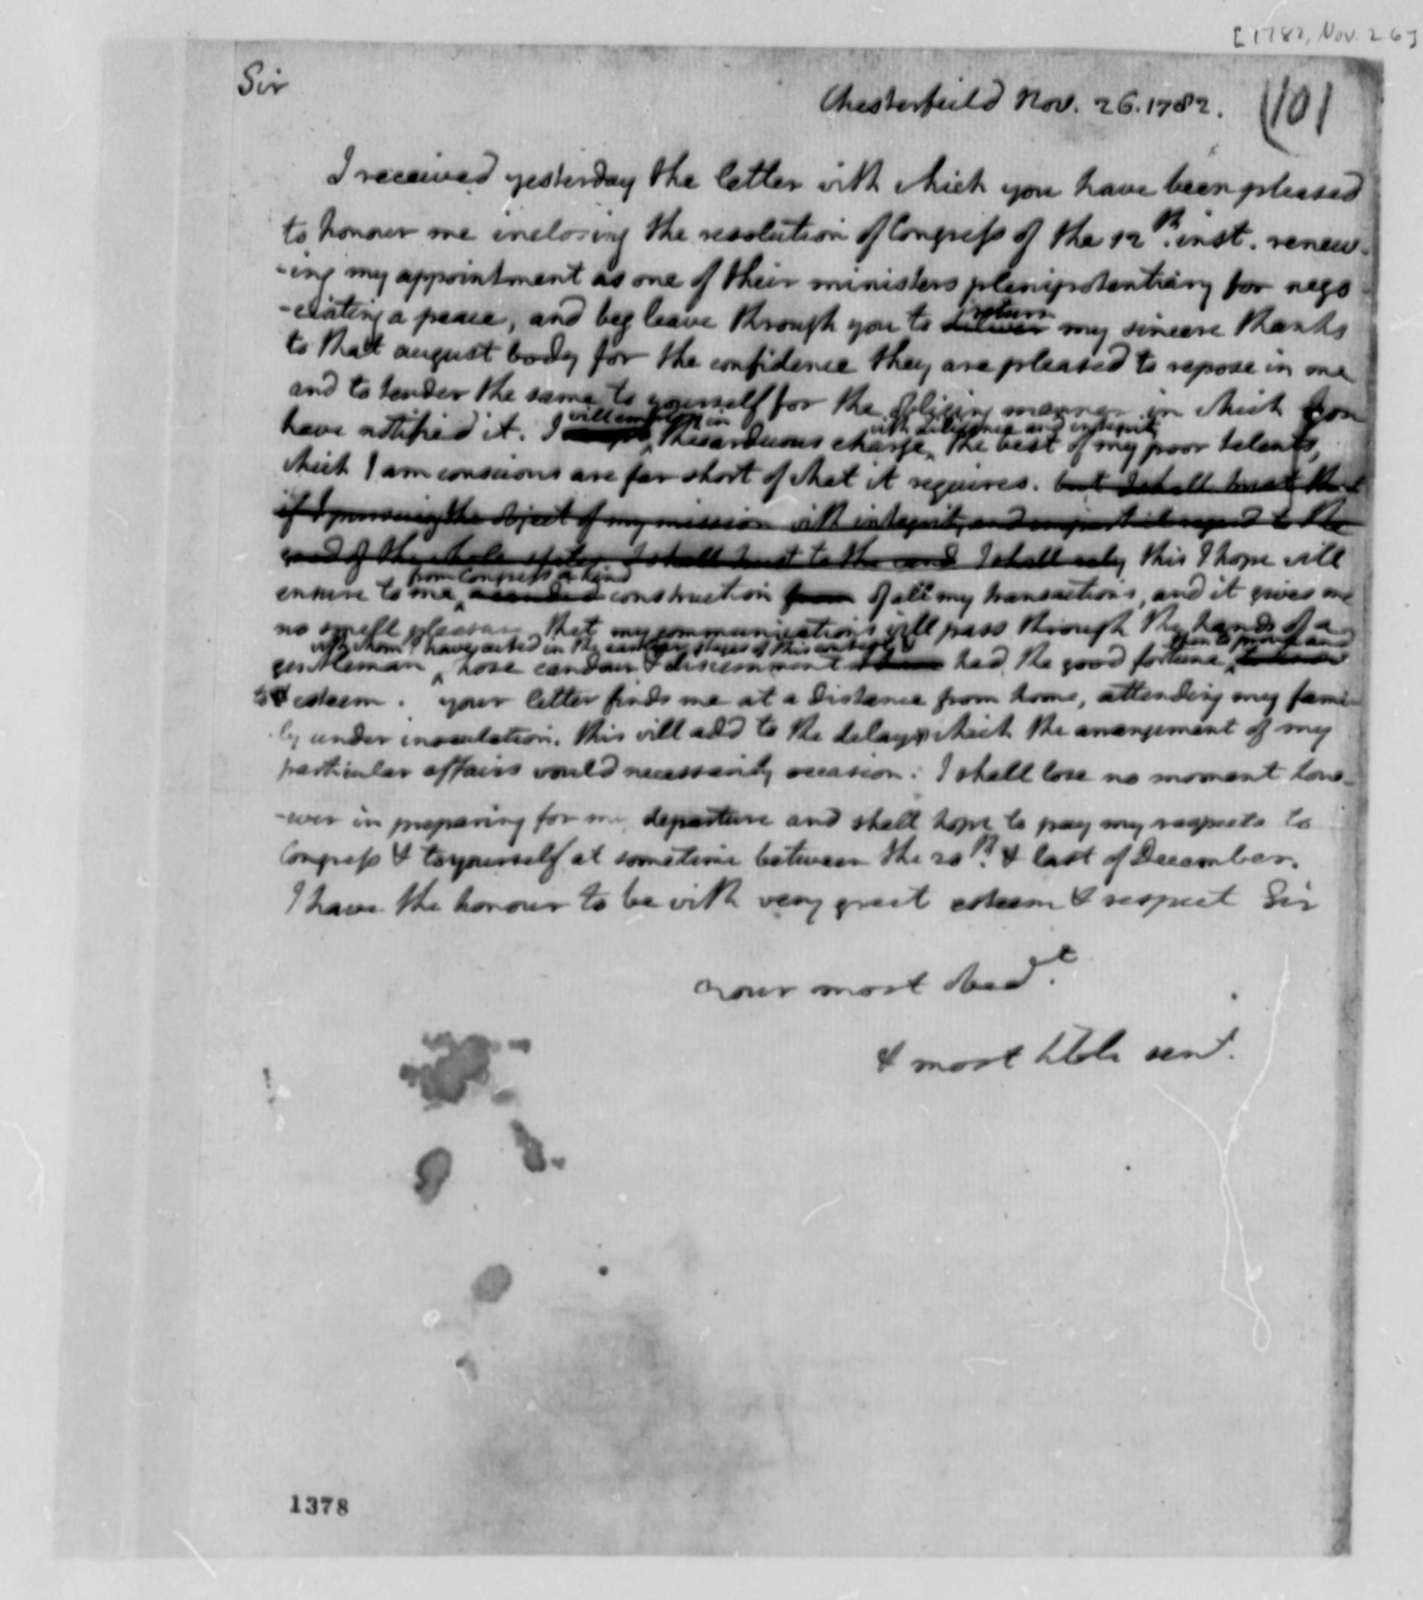 Thomas Jefferson to Robert R. Livingston, November 26, 1782